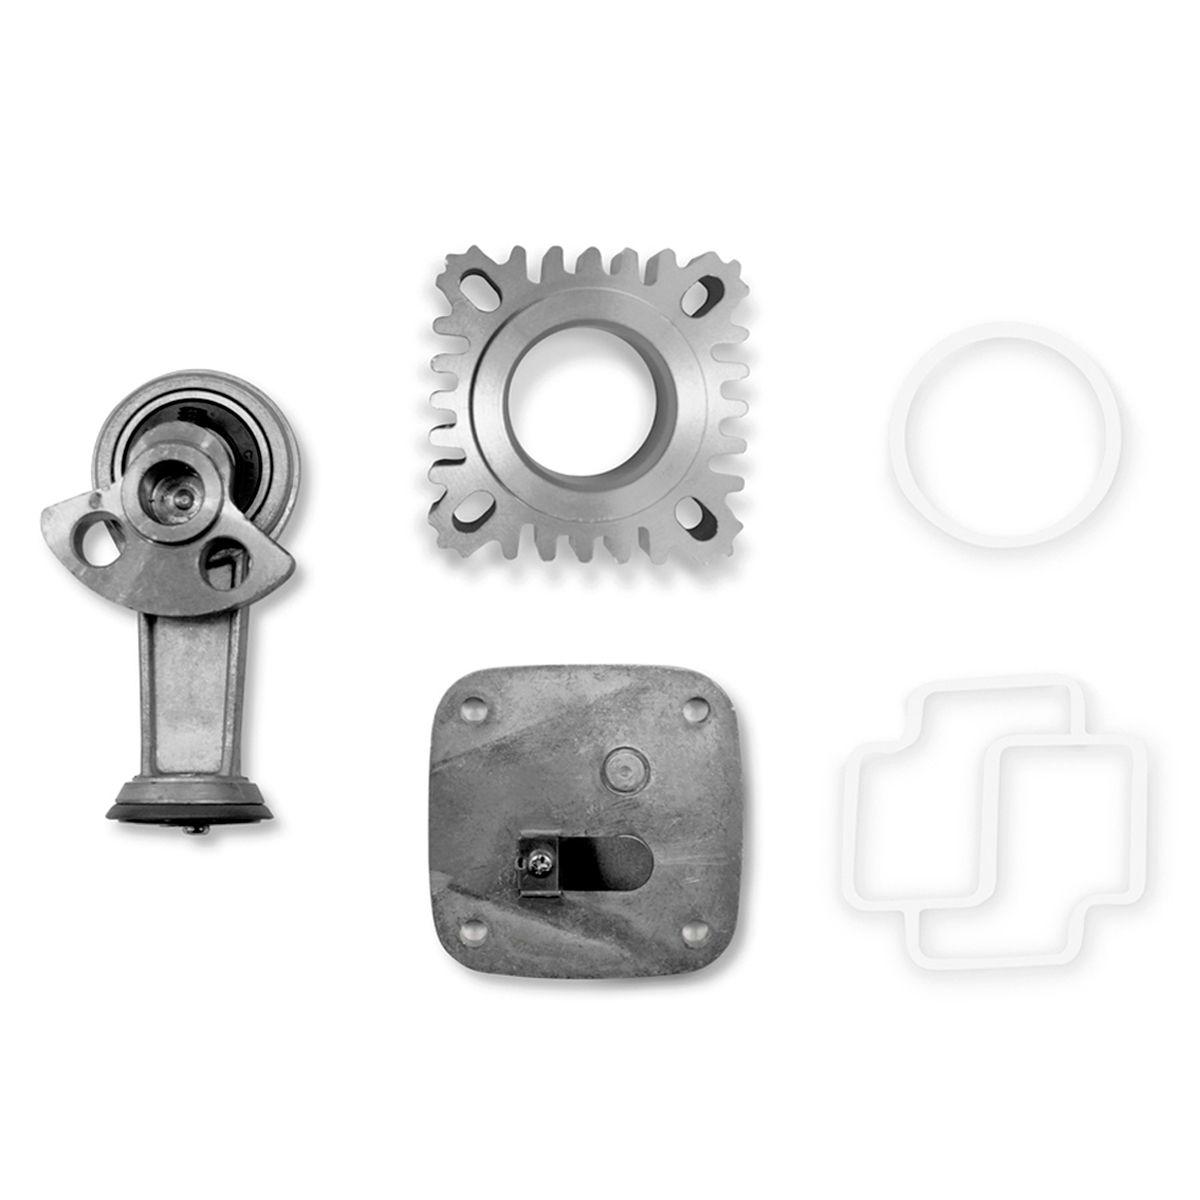 Kit Reparo Compressor Mod. 325c, 380c (Viair e Kobo Air - 3cm)